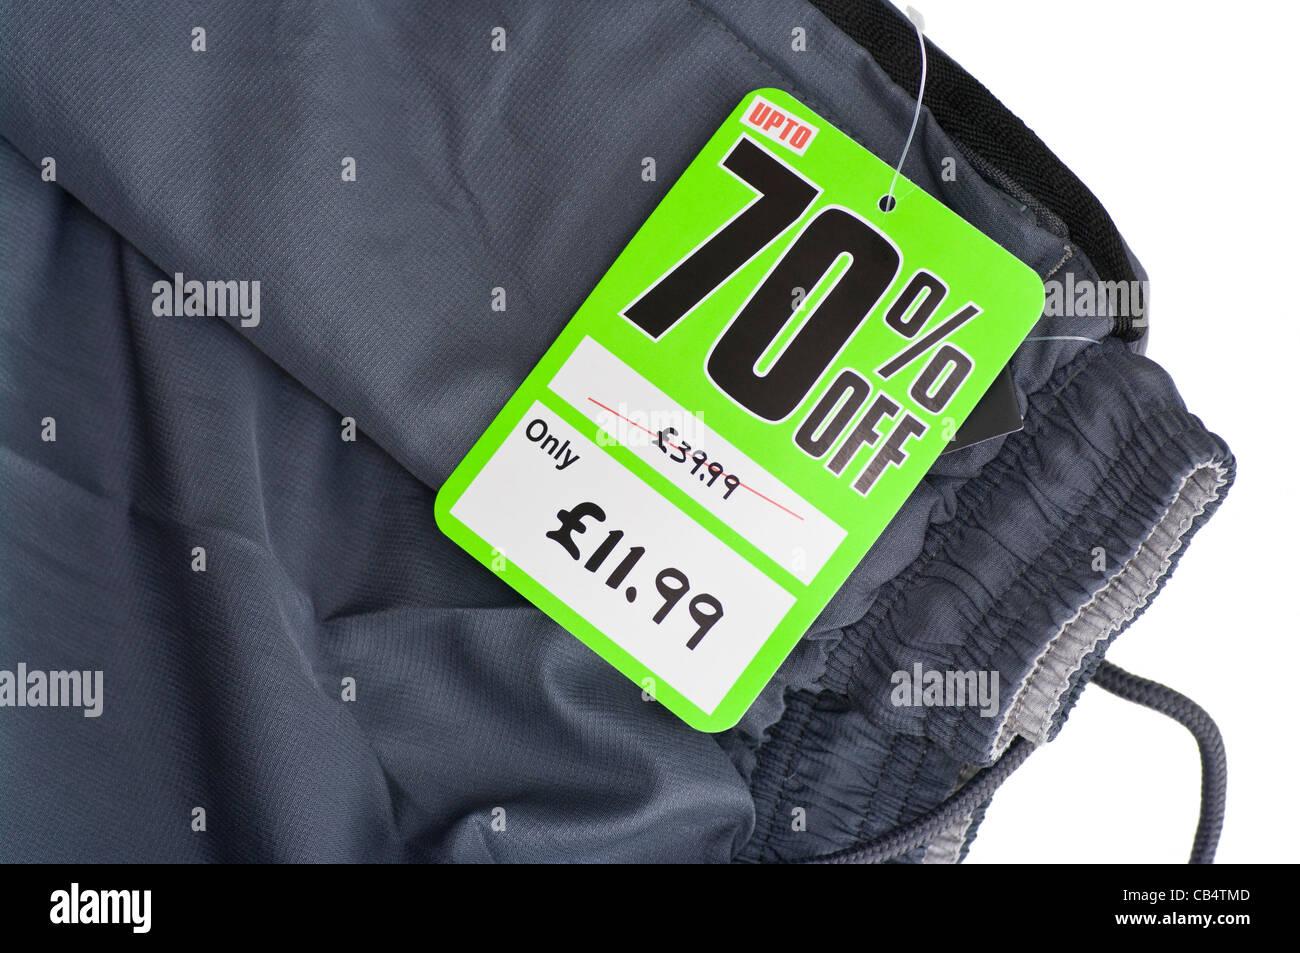 2017 Custom Printed Price Tags Clothing Hang Tags Printing ... |Price Tags For Clothing